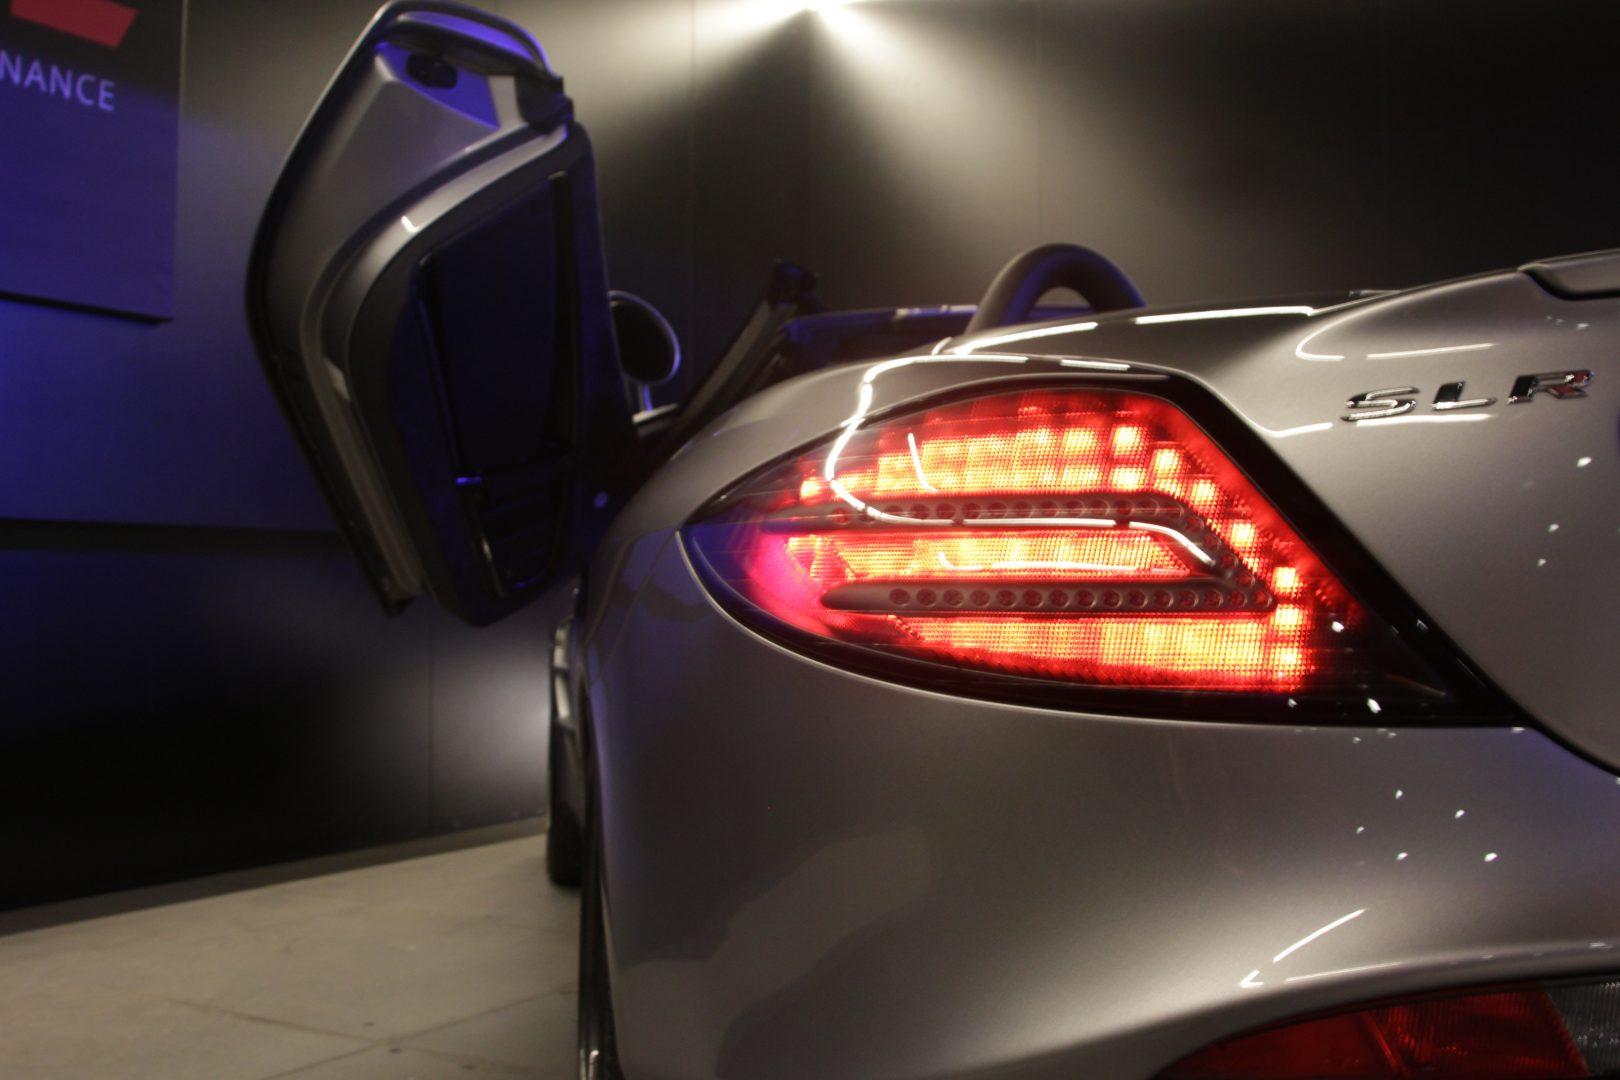 AIL Mercedes-Benz SLR McLaren Roadster 722 S 2